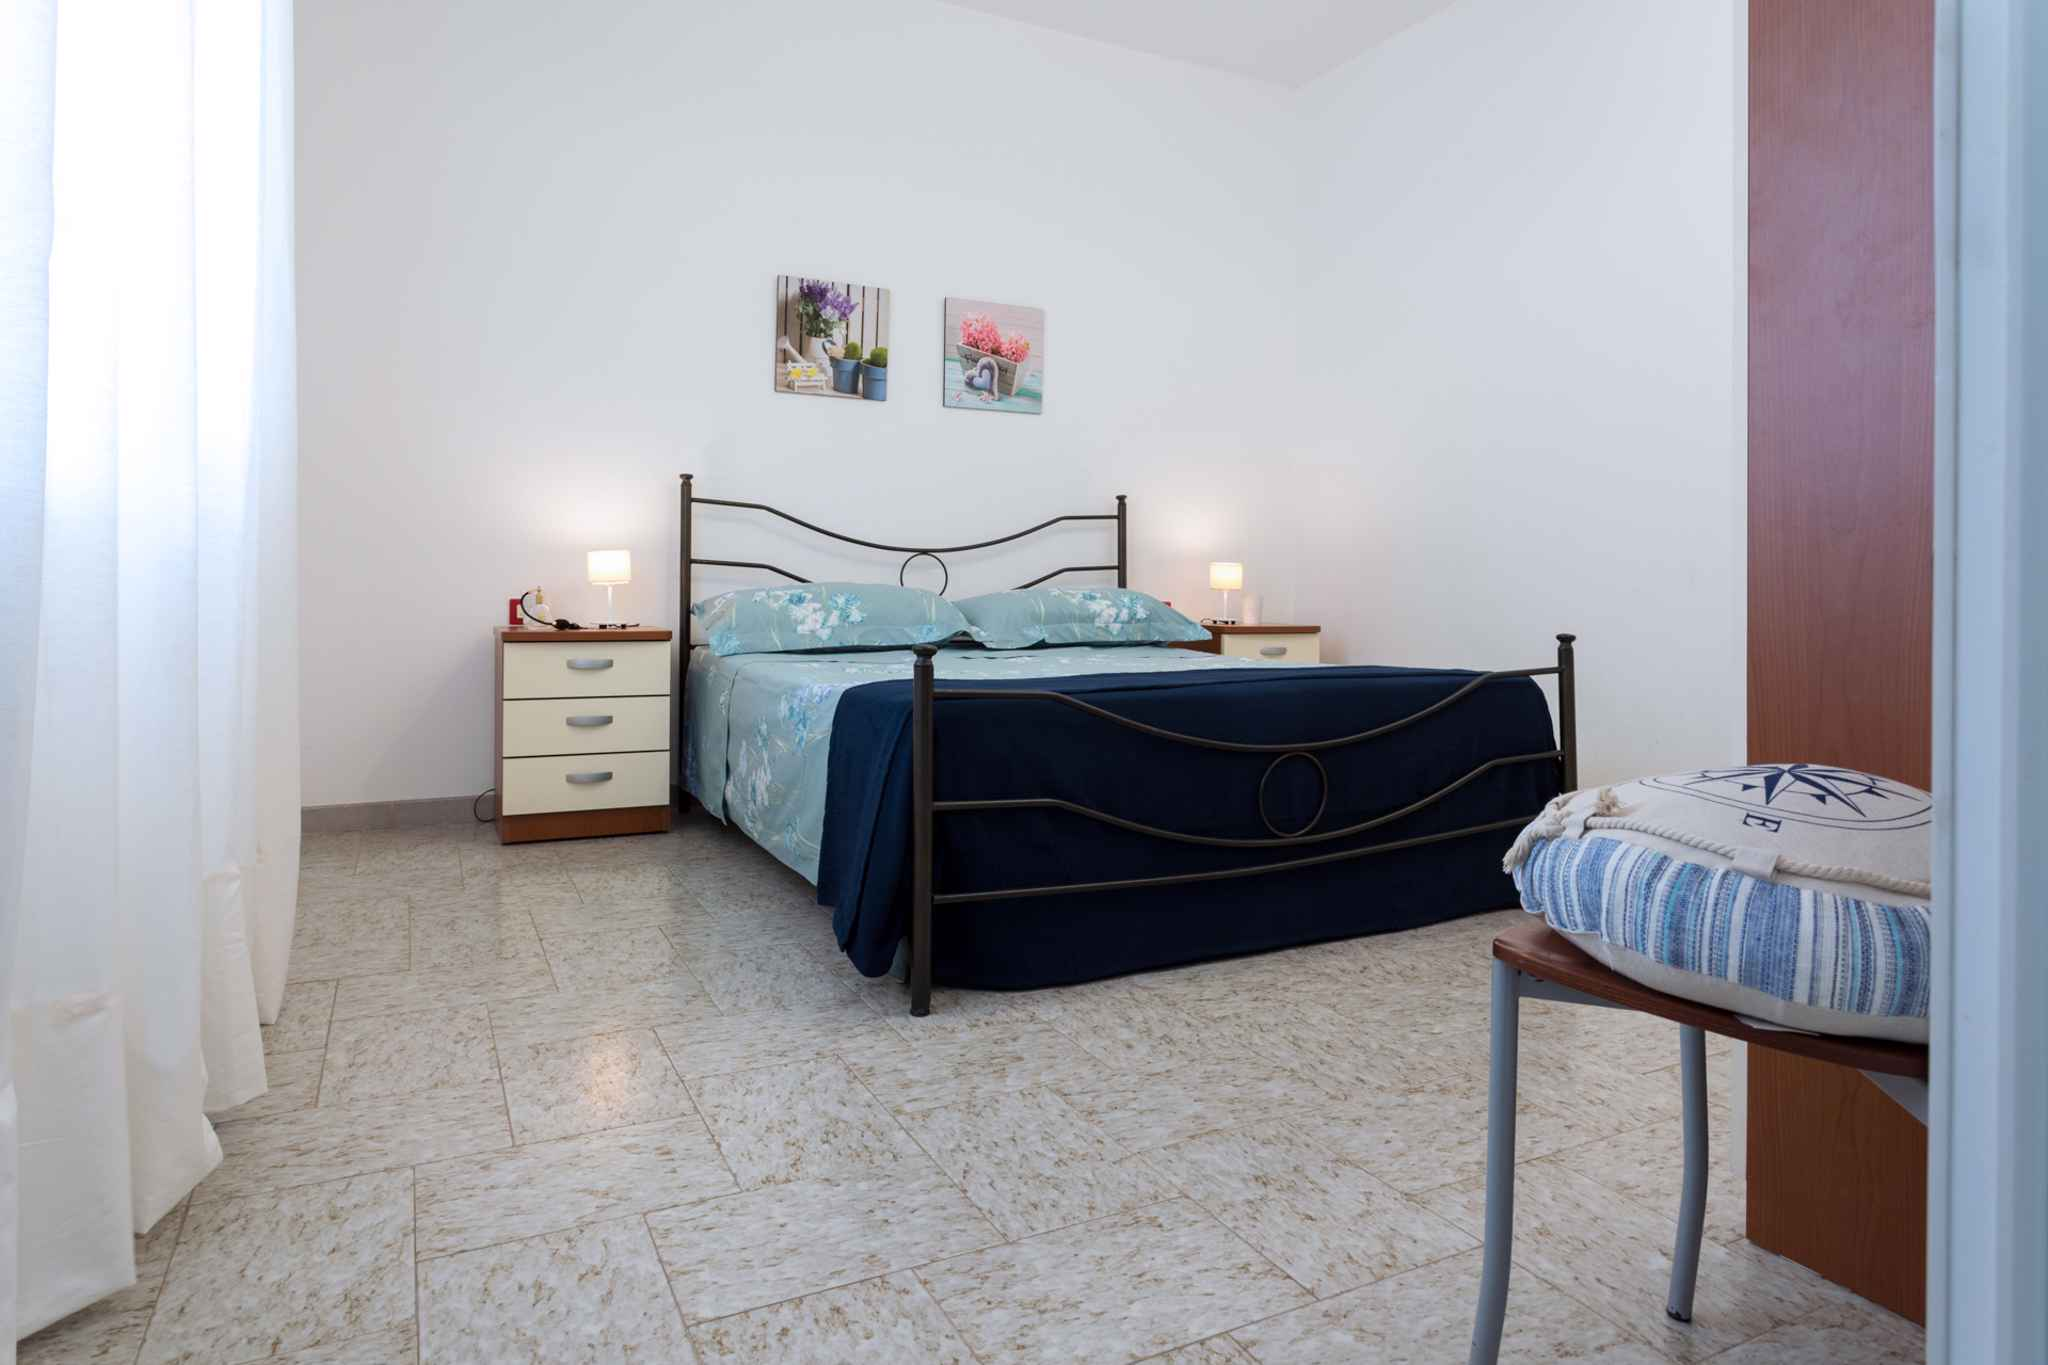 Ferienhaus Vicino Al Mare (560014), Alliste, Lecce, Apulien, Italien, Bild 12